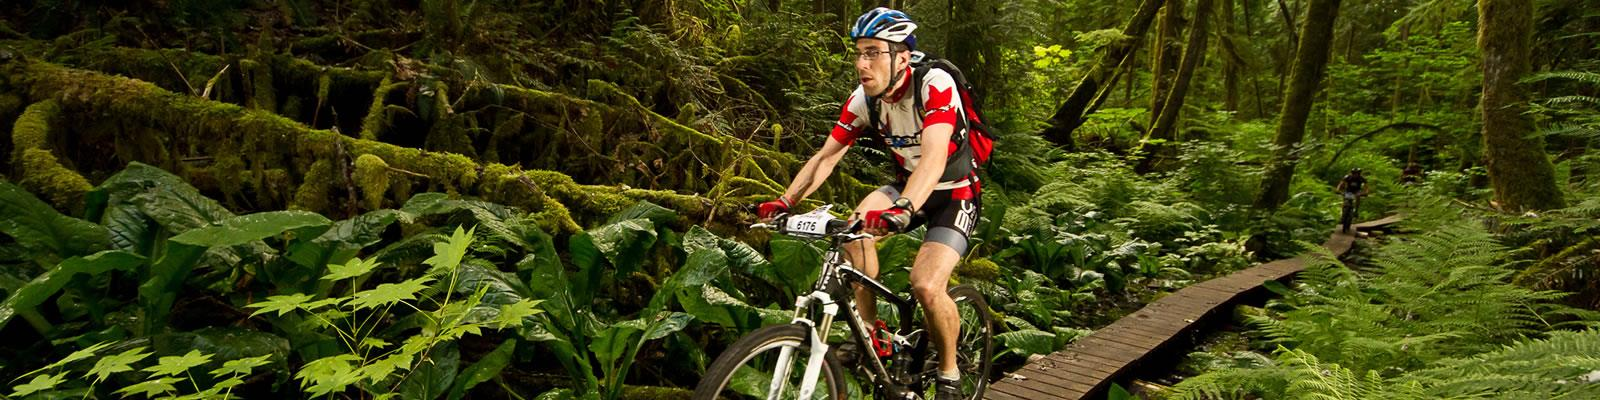 Legendary Mountain Biking